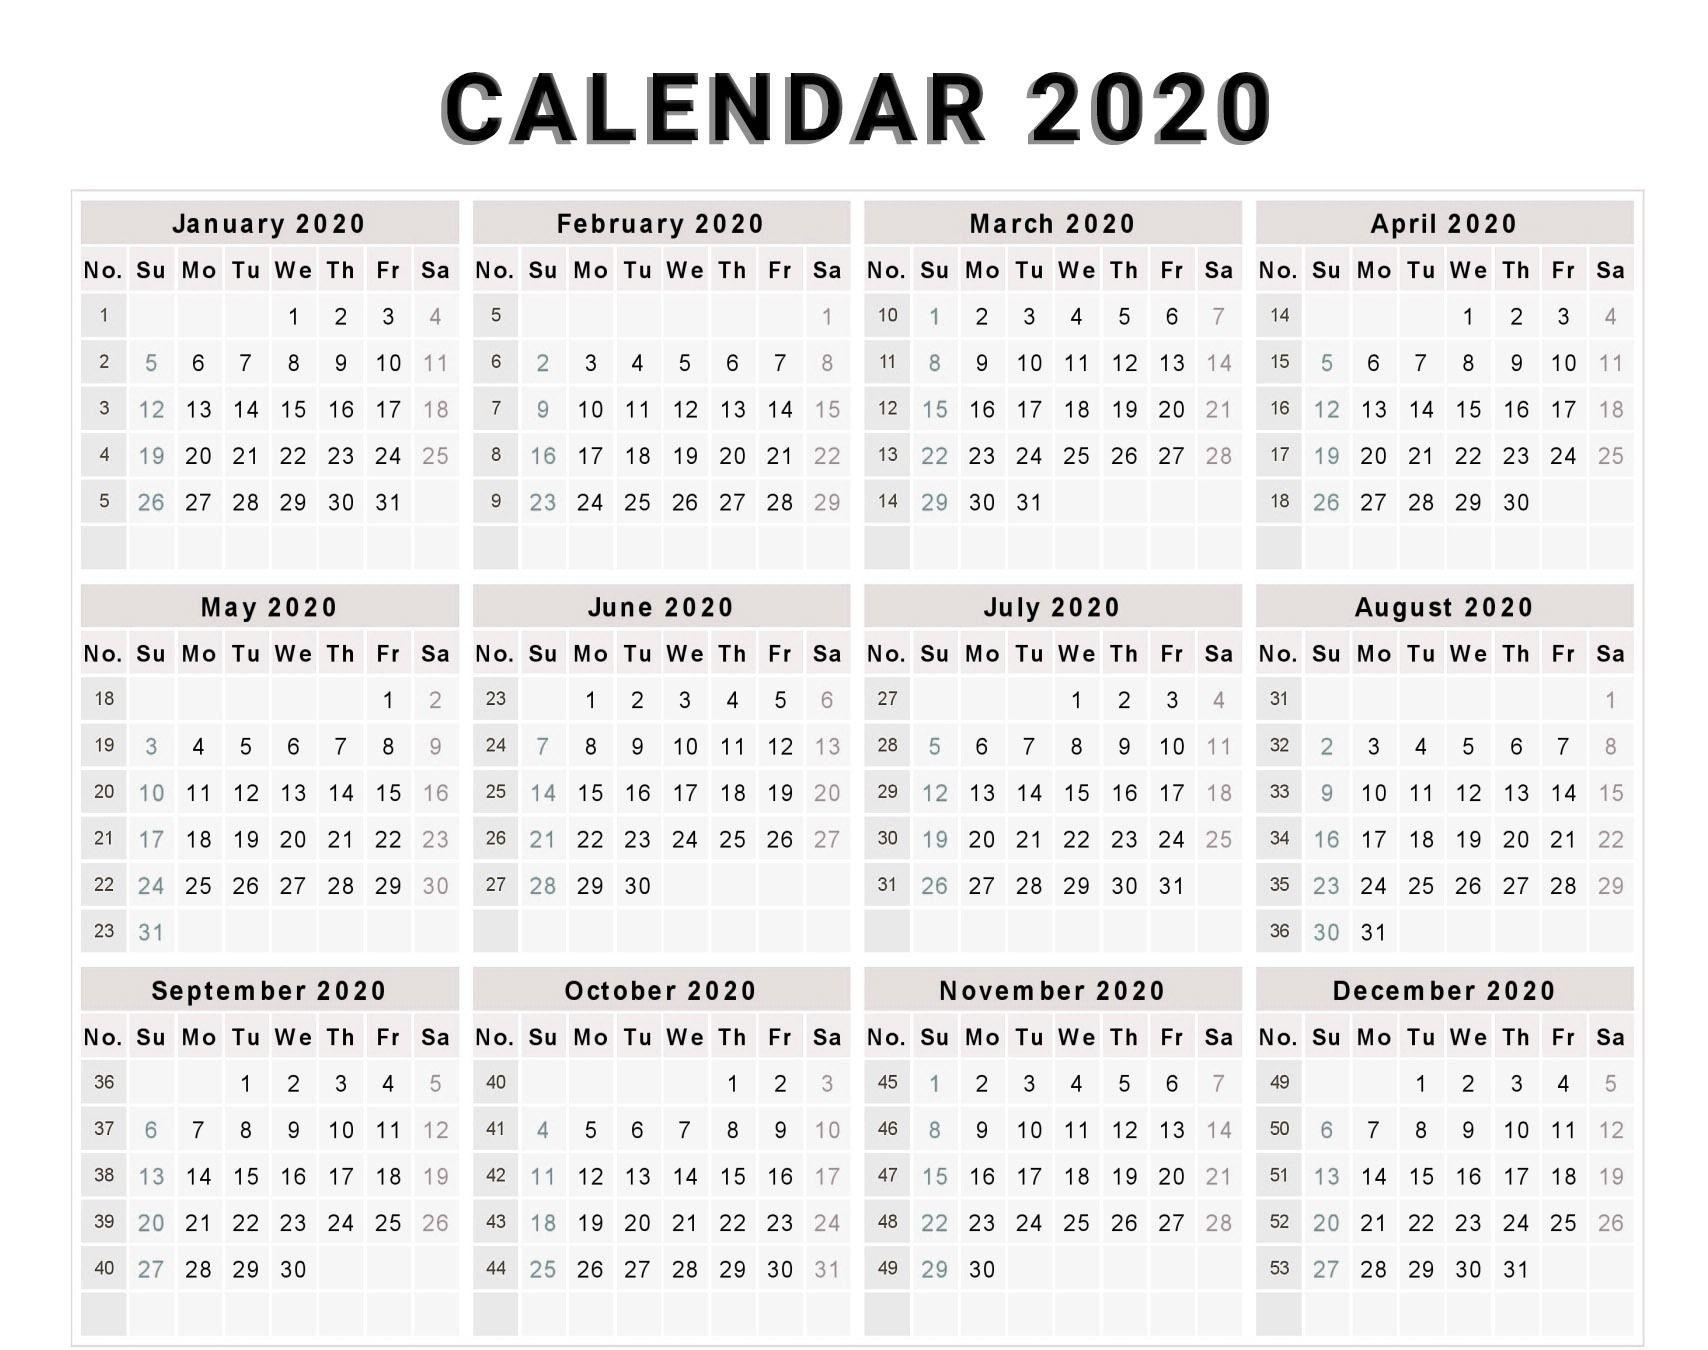 Collect Week Wise 2021 Calendar